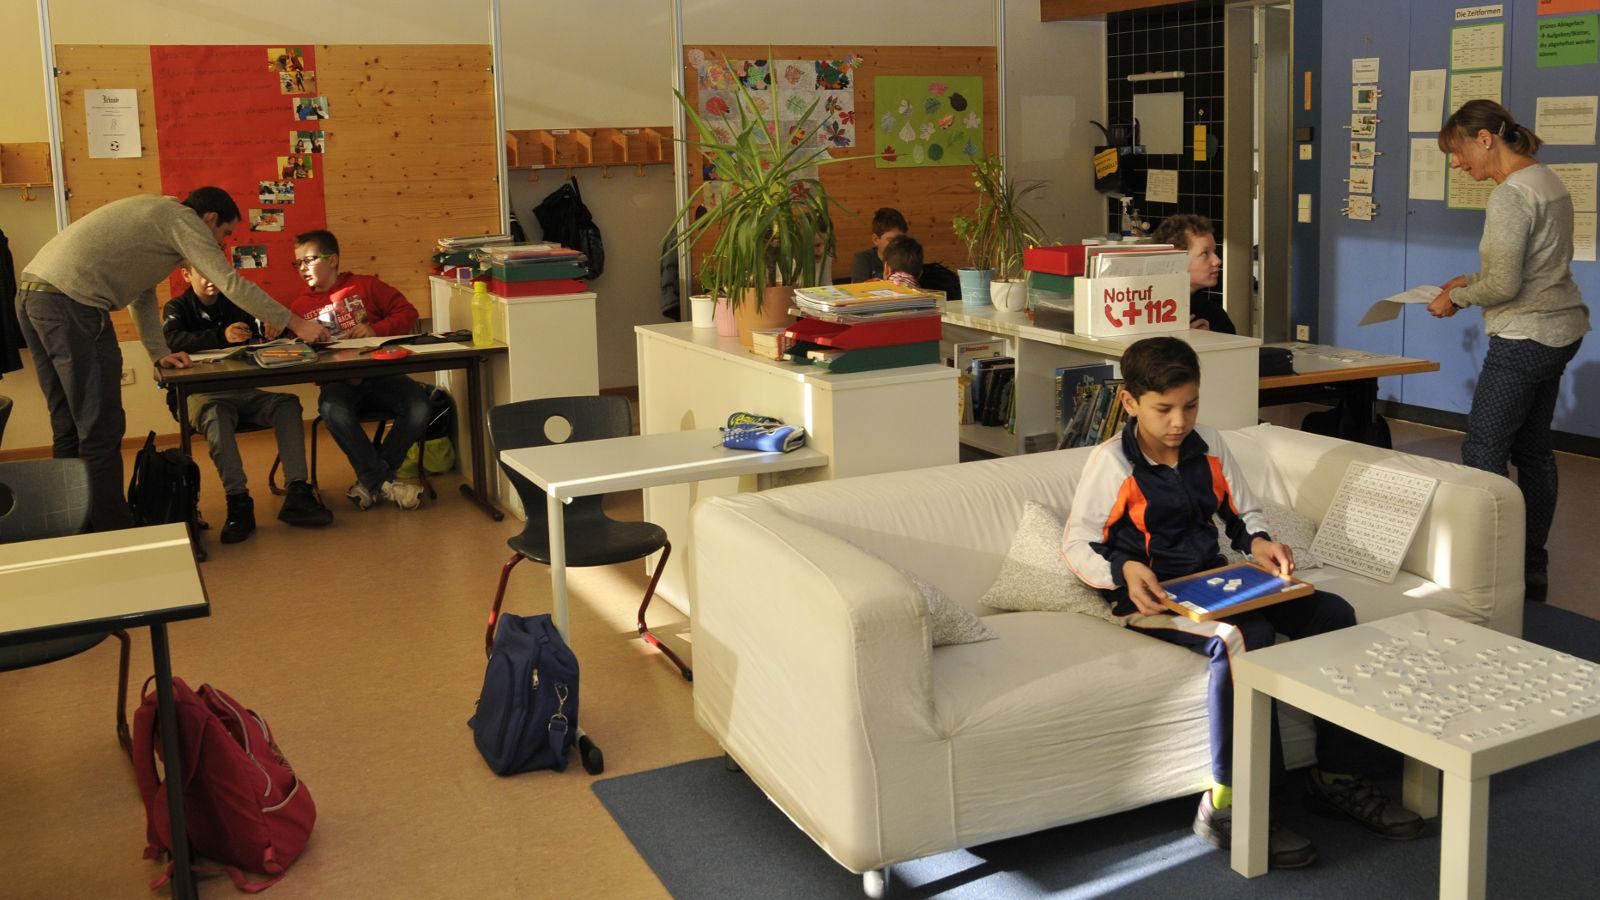 Individuelles Lernen/ Totale auf Klassenzimmer